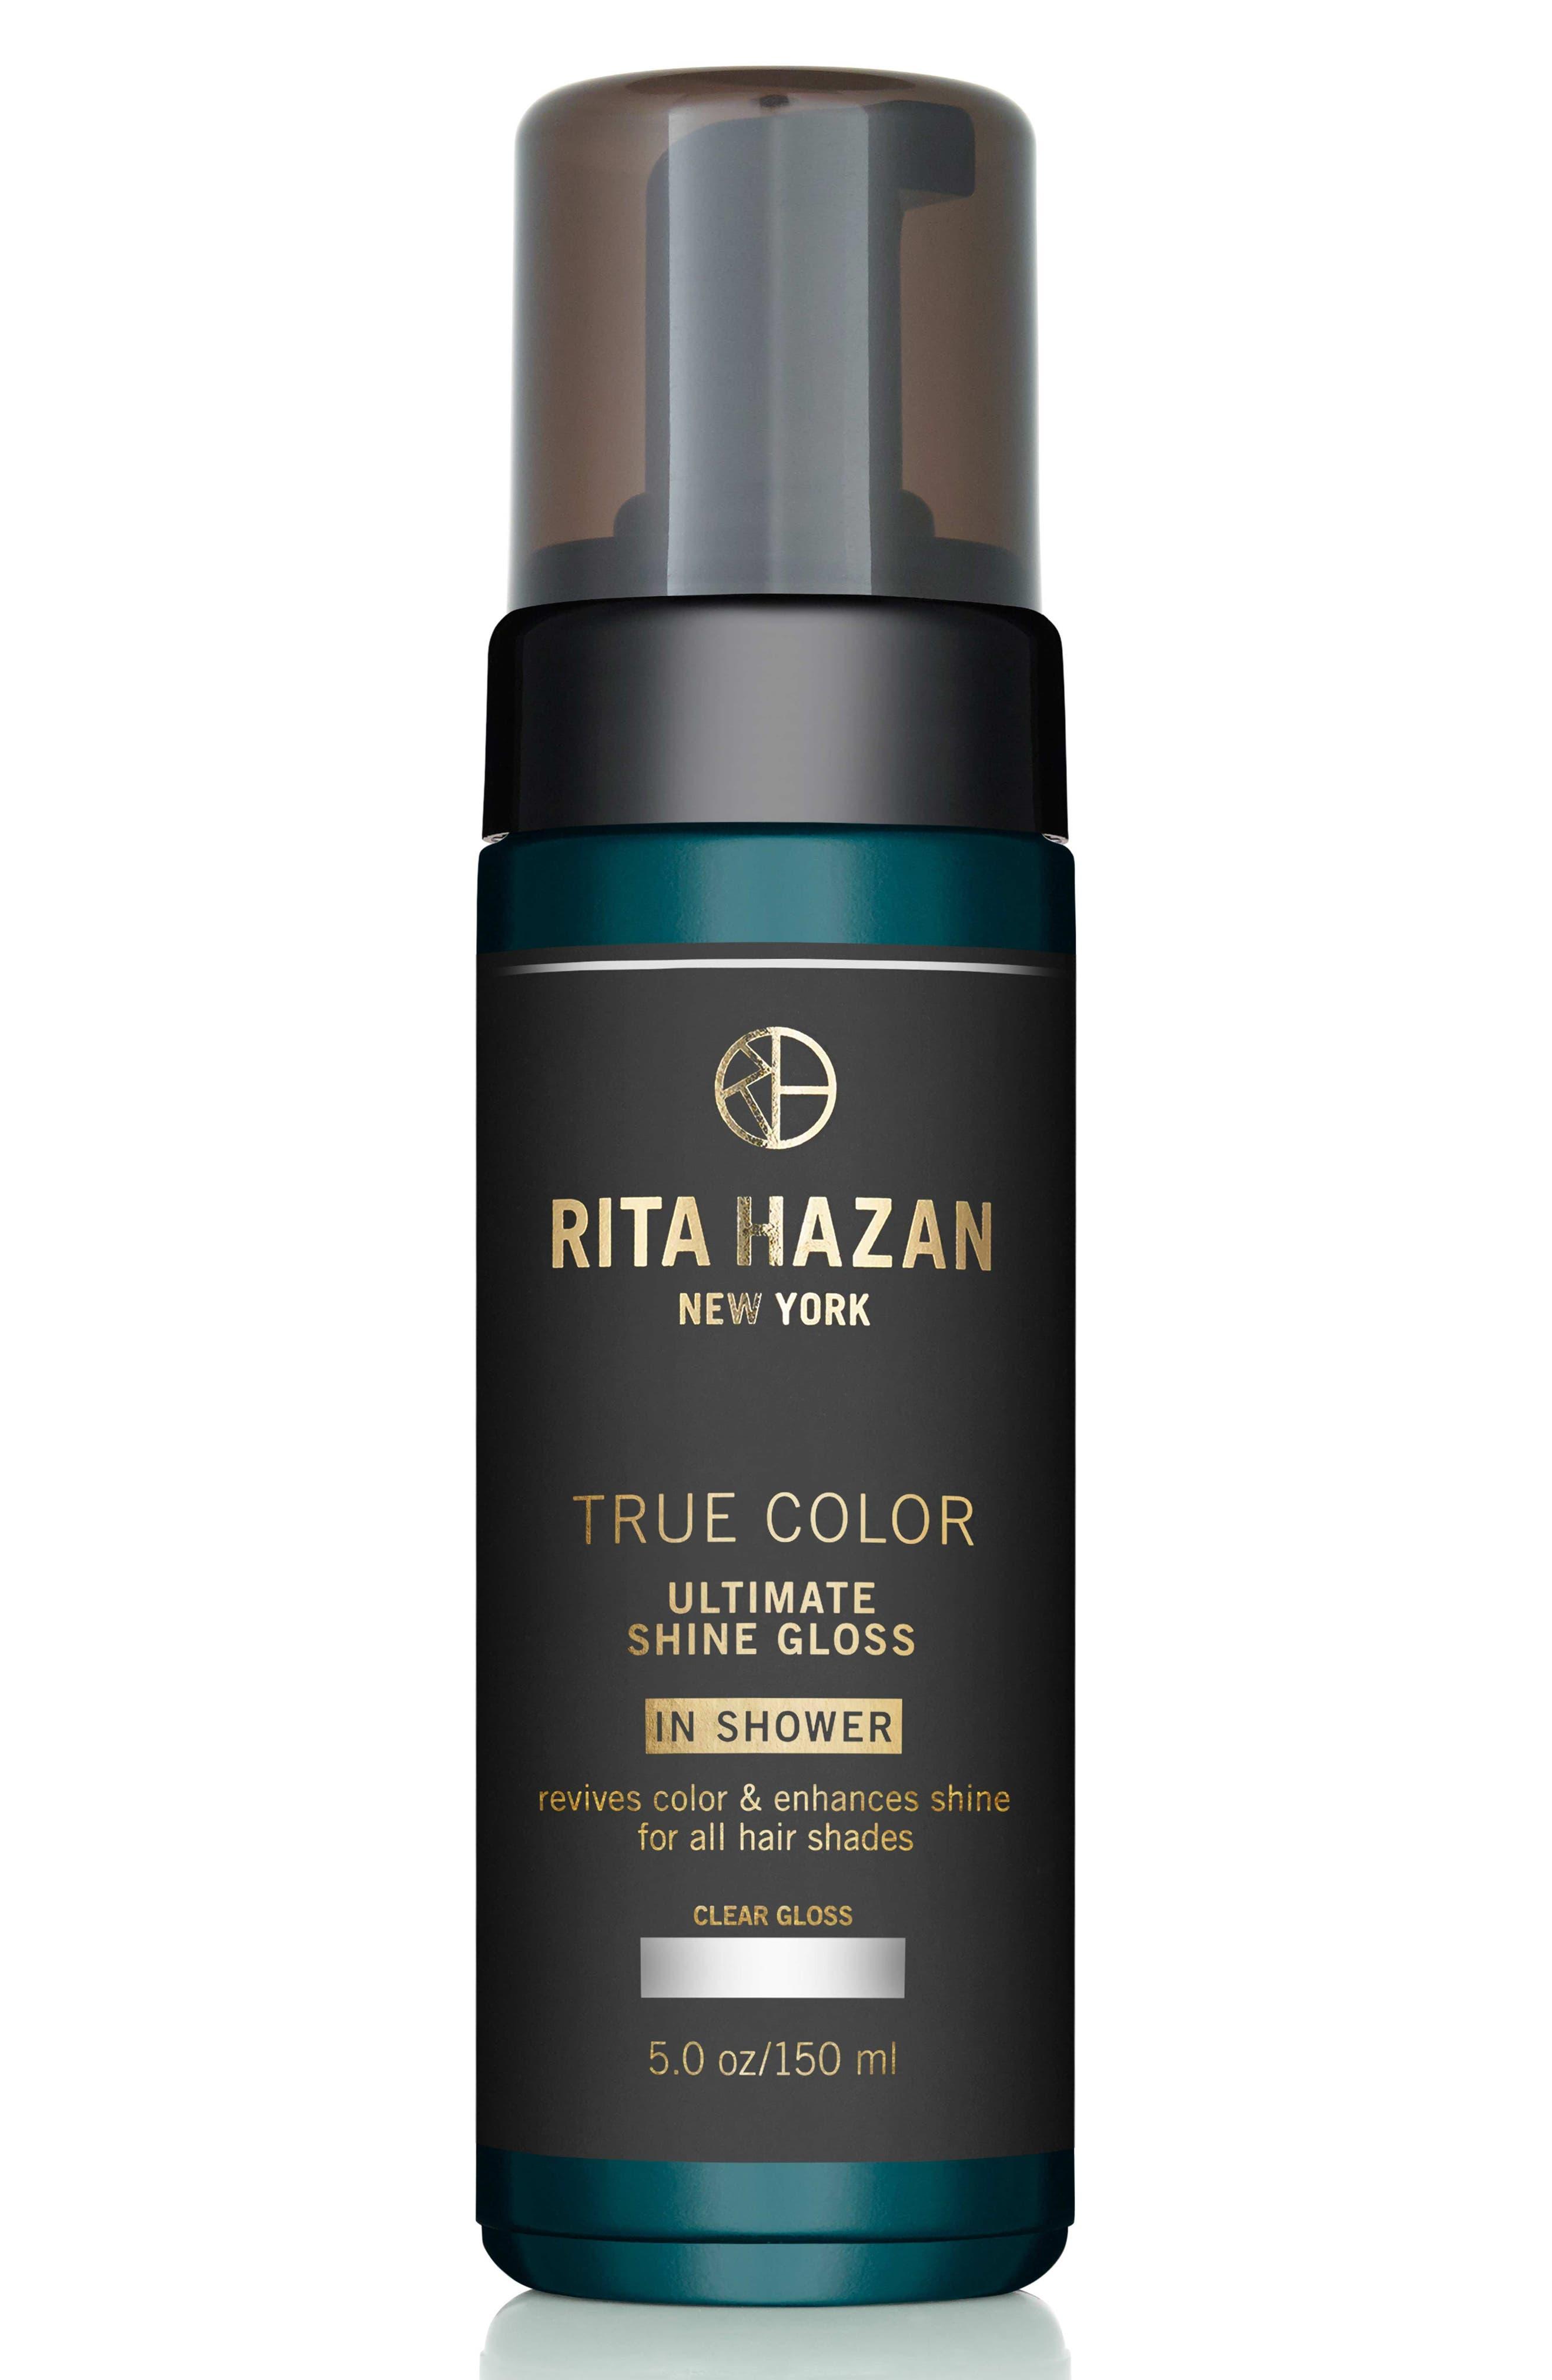 RITA HAZAN NEW YORK, 'True Color' Ultimate Shine Gloss, Main thumbnail 1, color, CLEAR